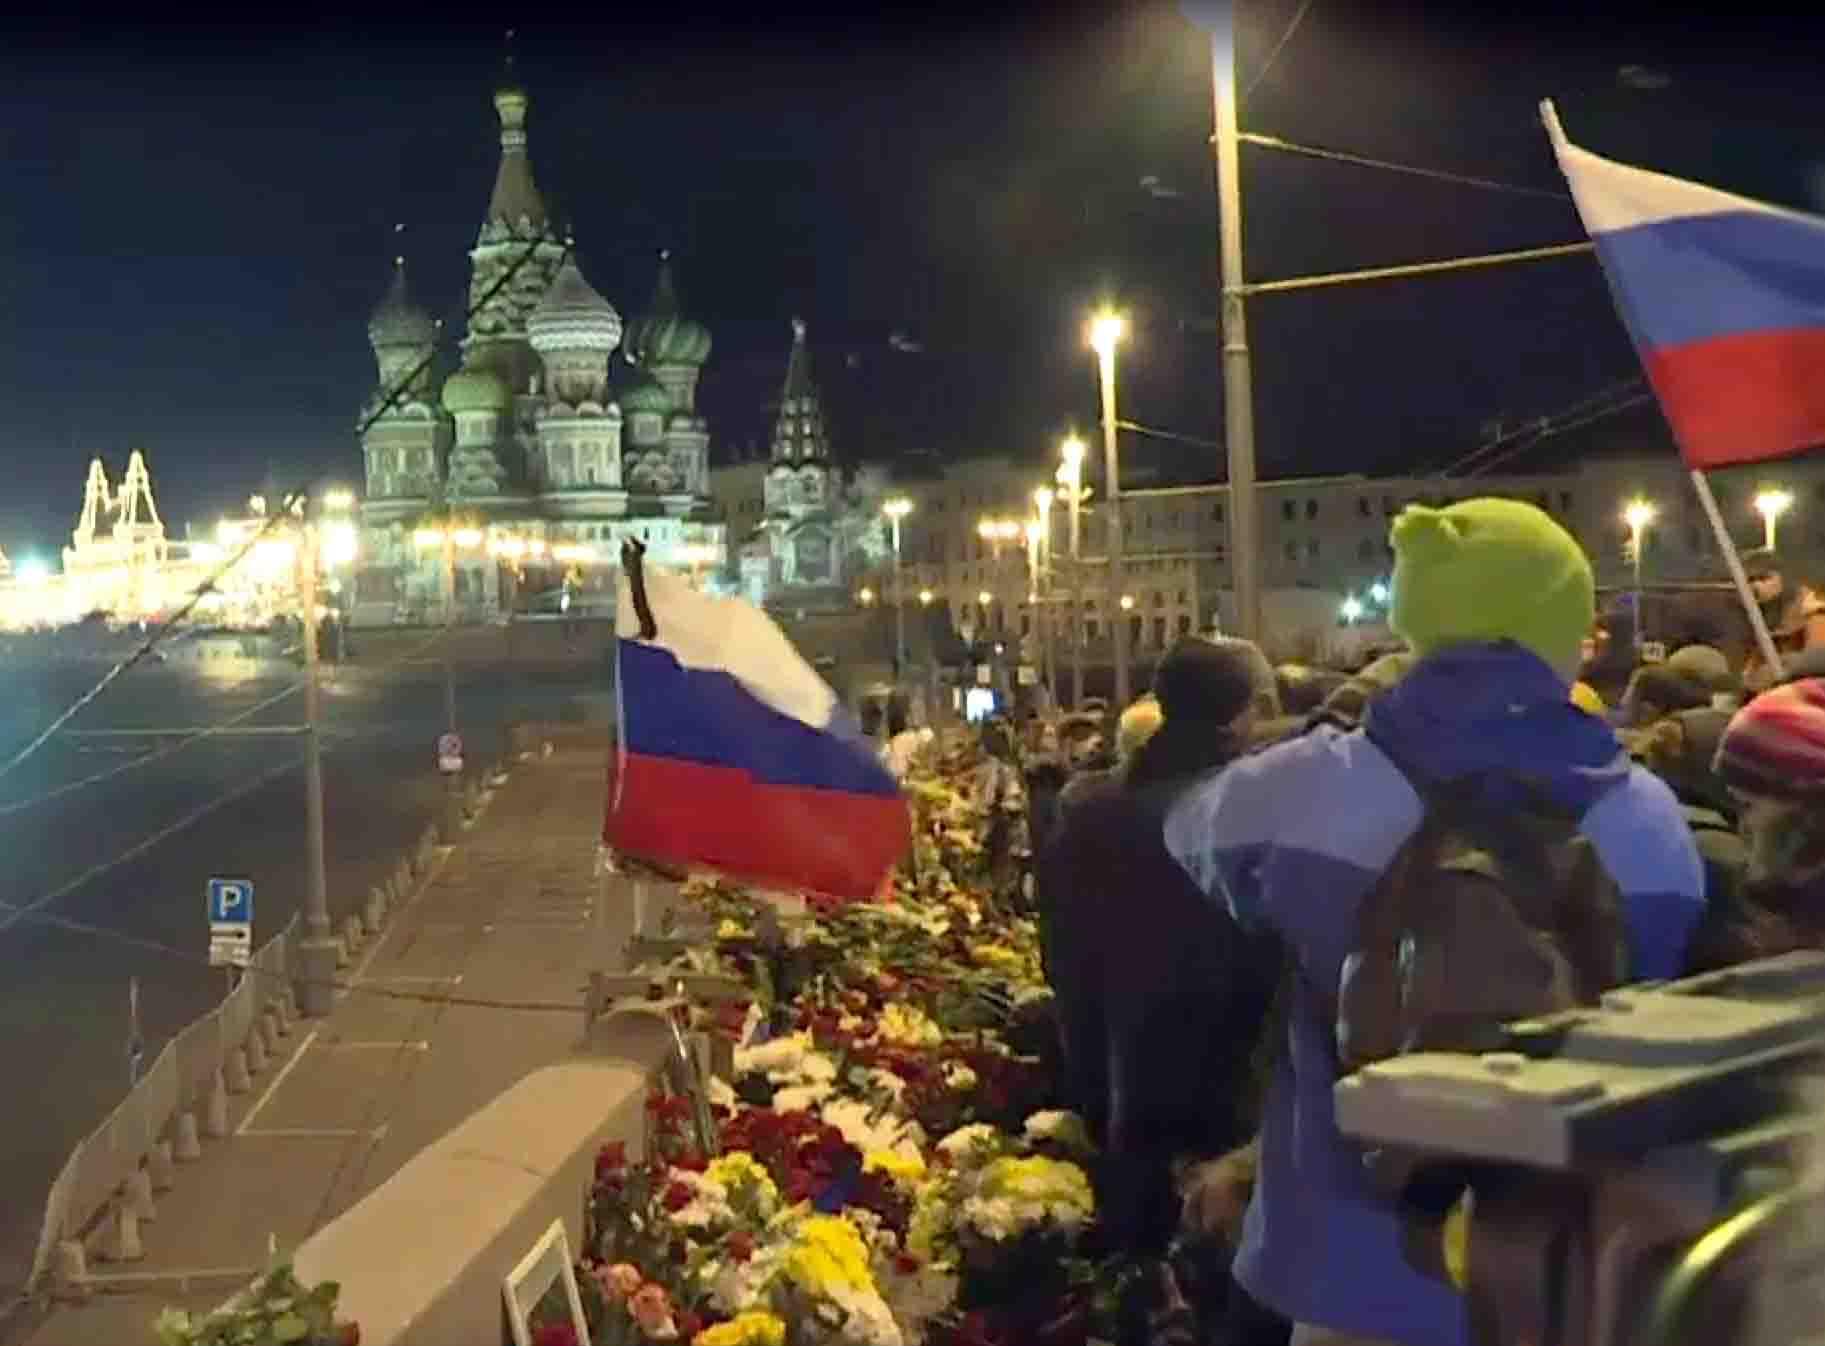 B. Nemcovo pagerbimo vakaras ant Didžiojo Moskvareckajos tilto | Alkas.lt, V. Gerasimovo nuotr.